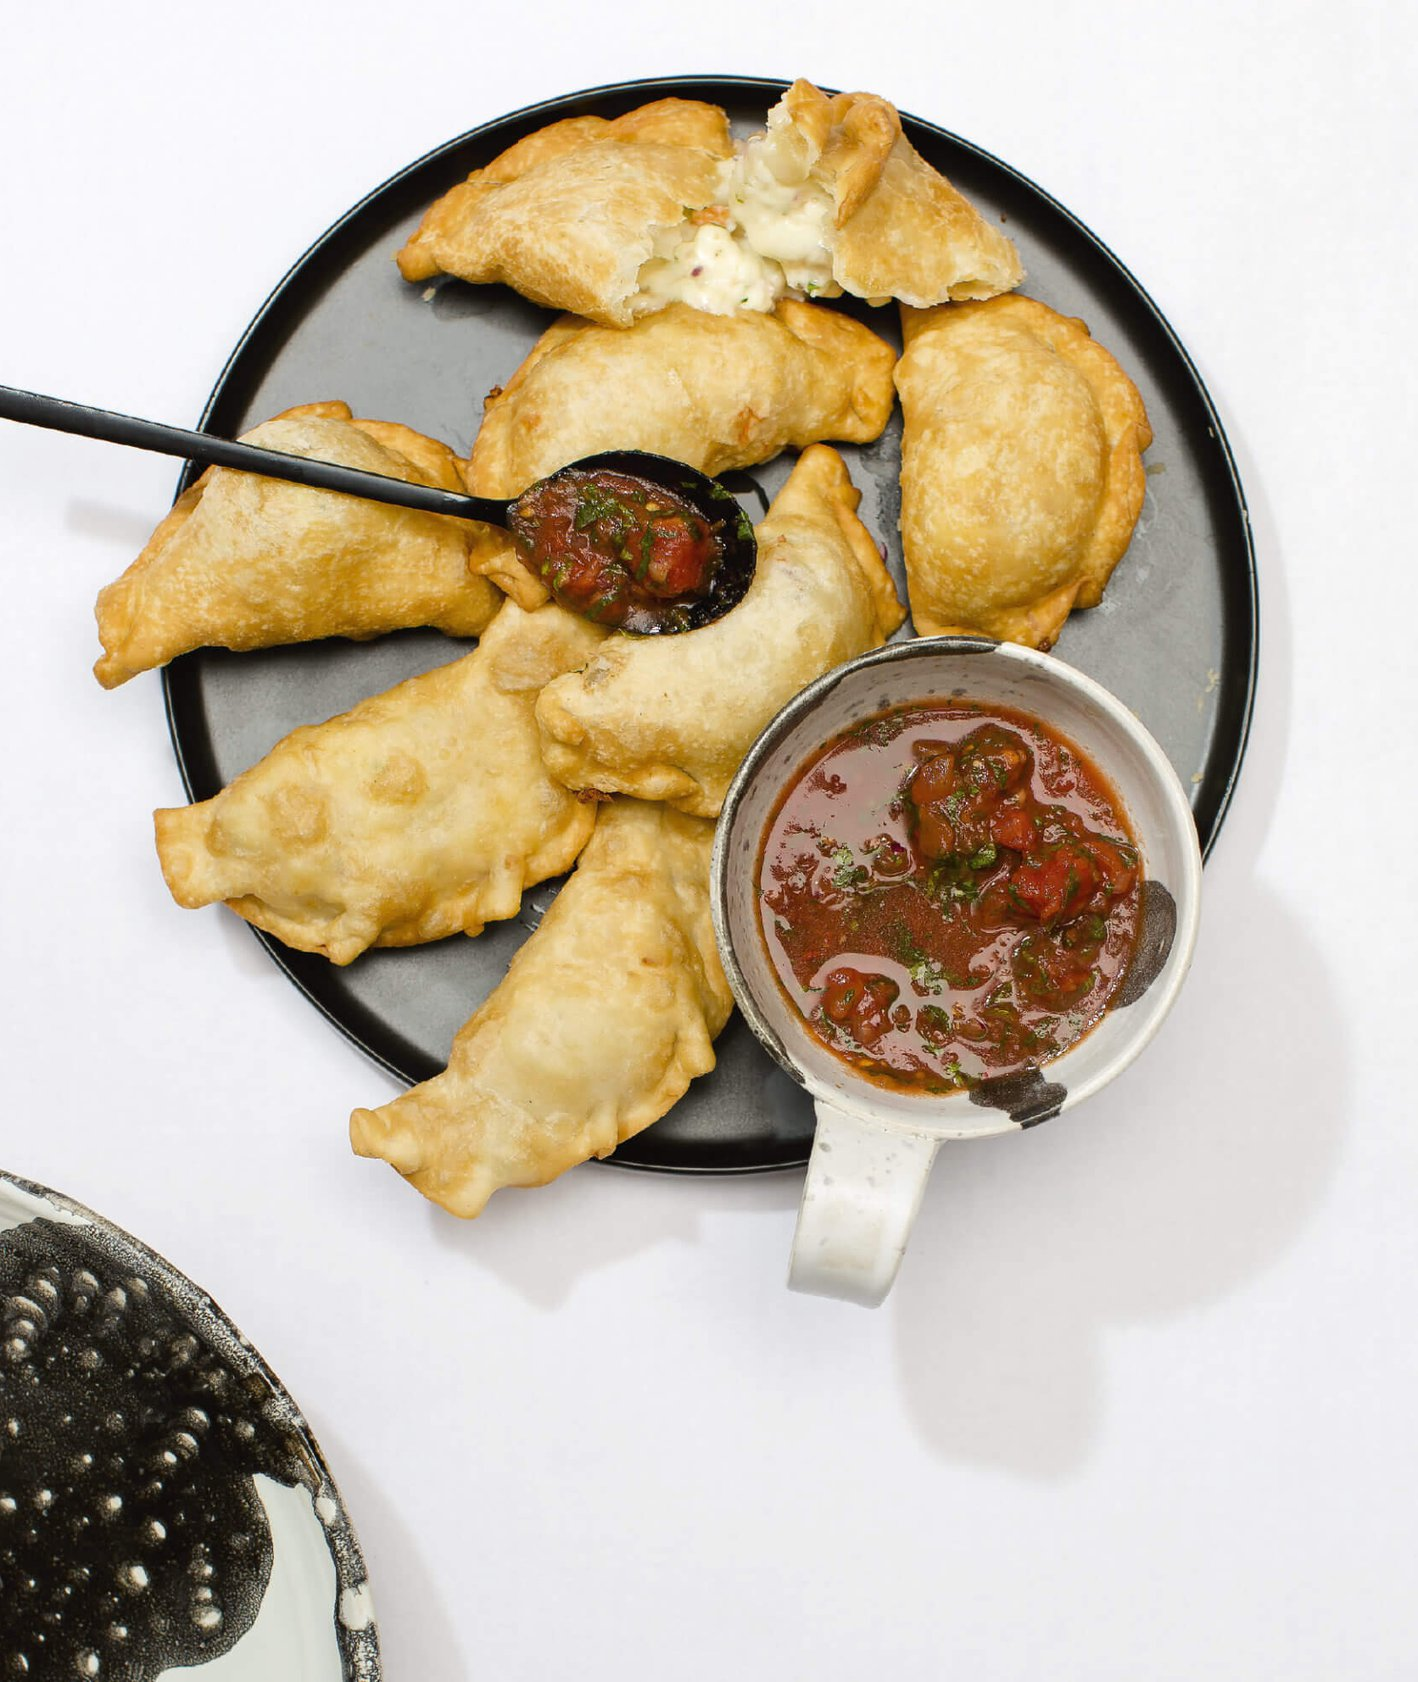 Talerz empanadas z krewetkami i mozzarellą, sos pebre, listki kolendry